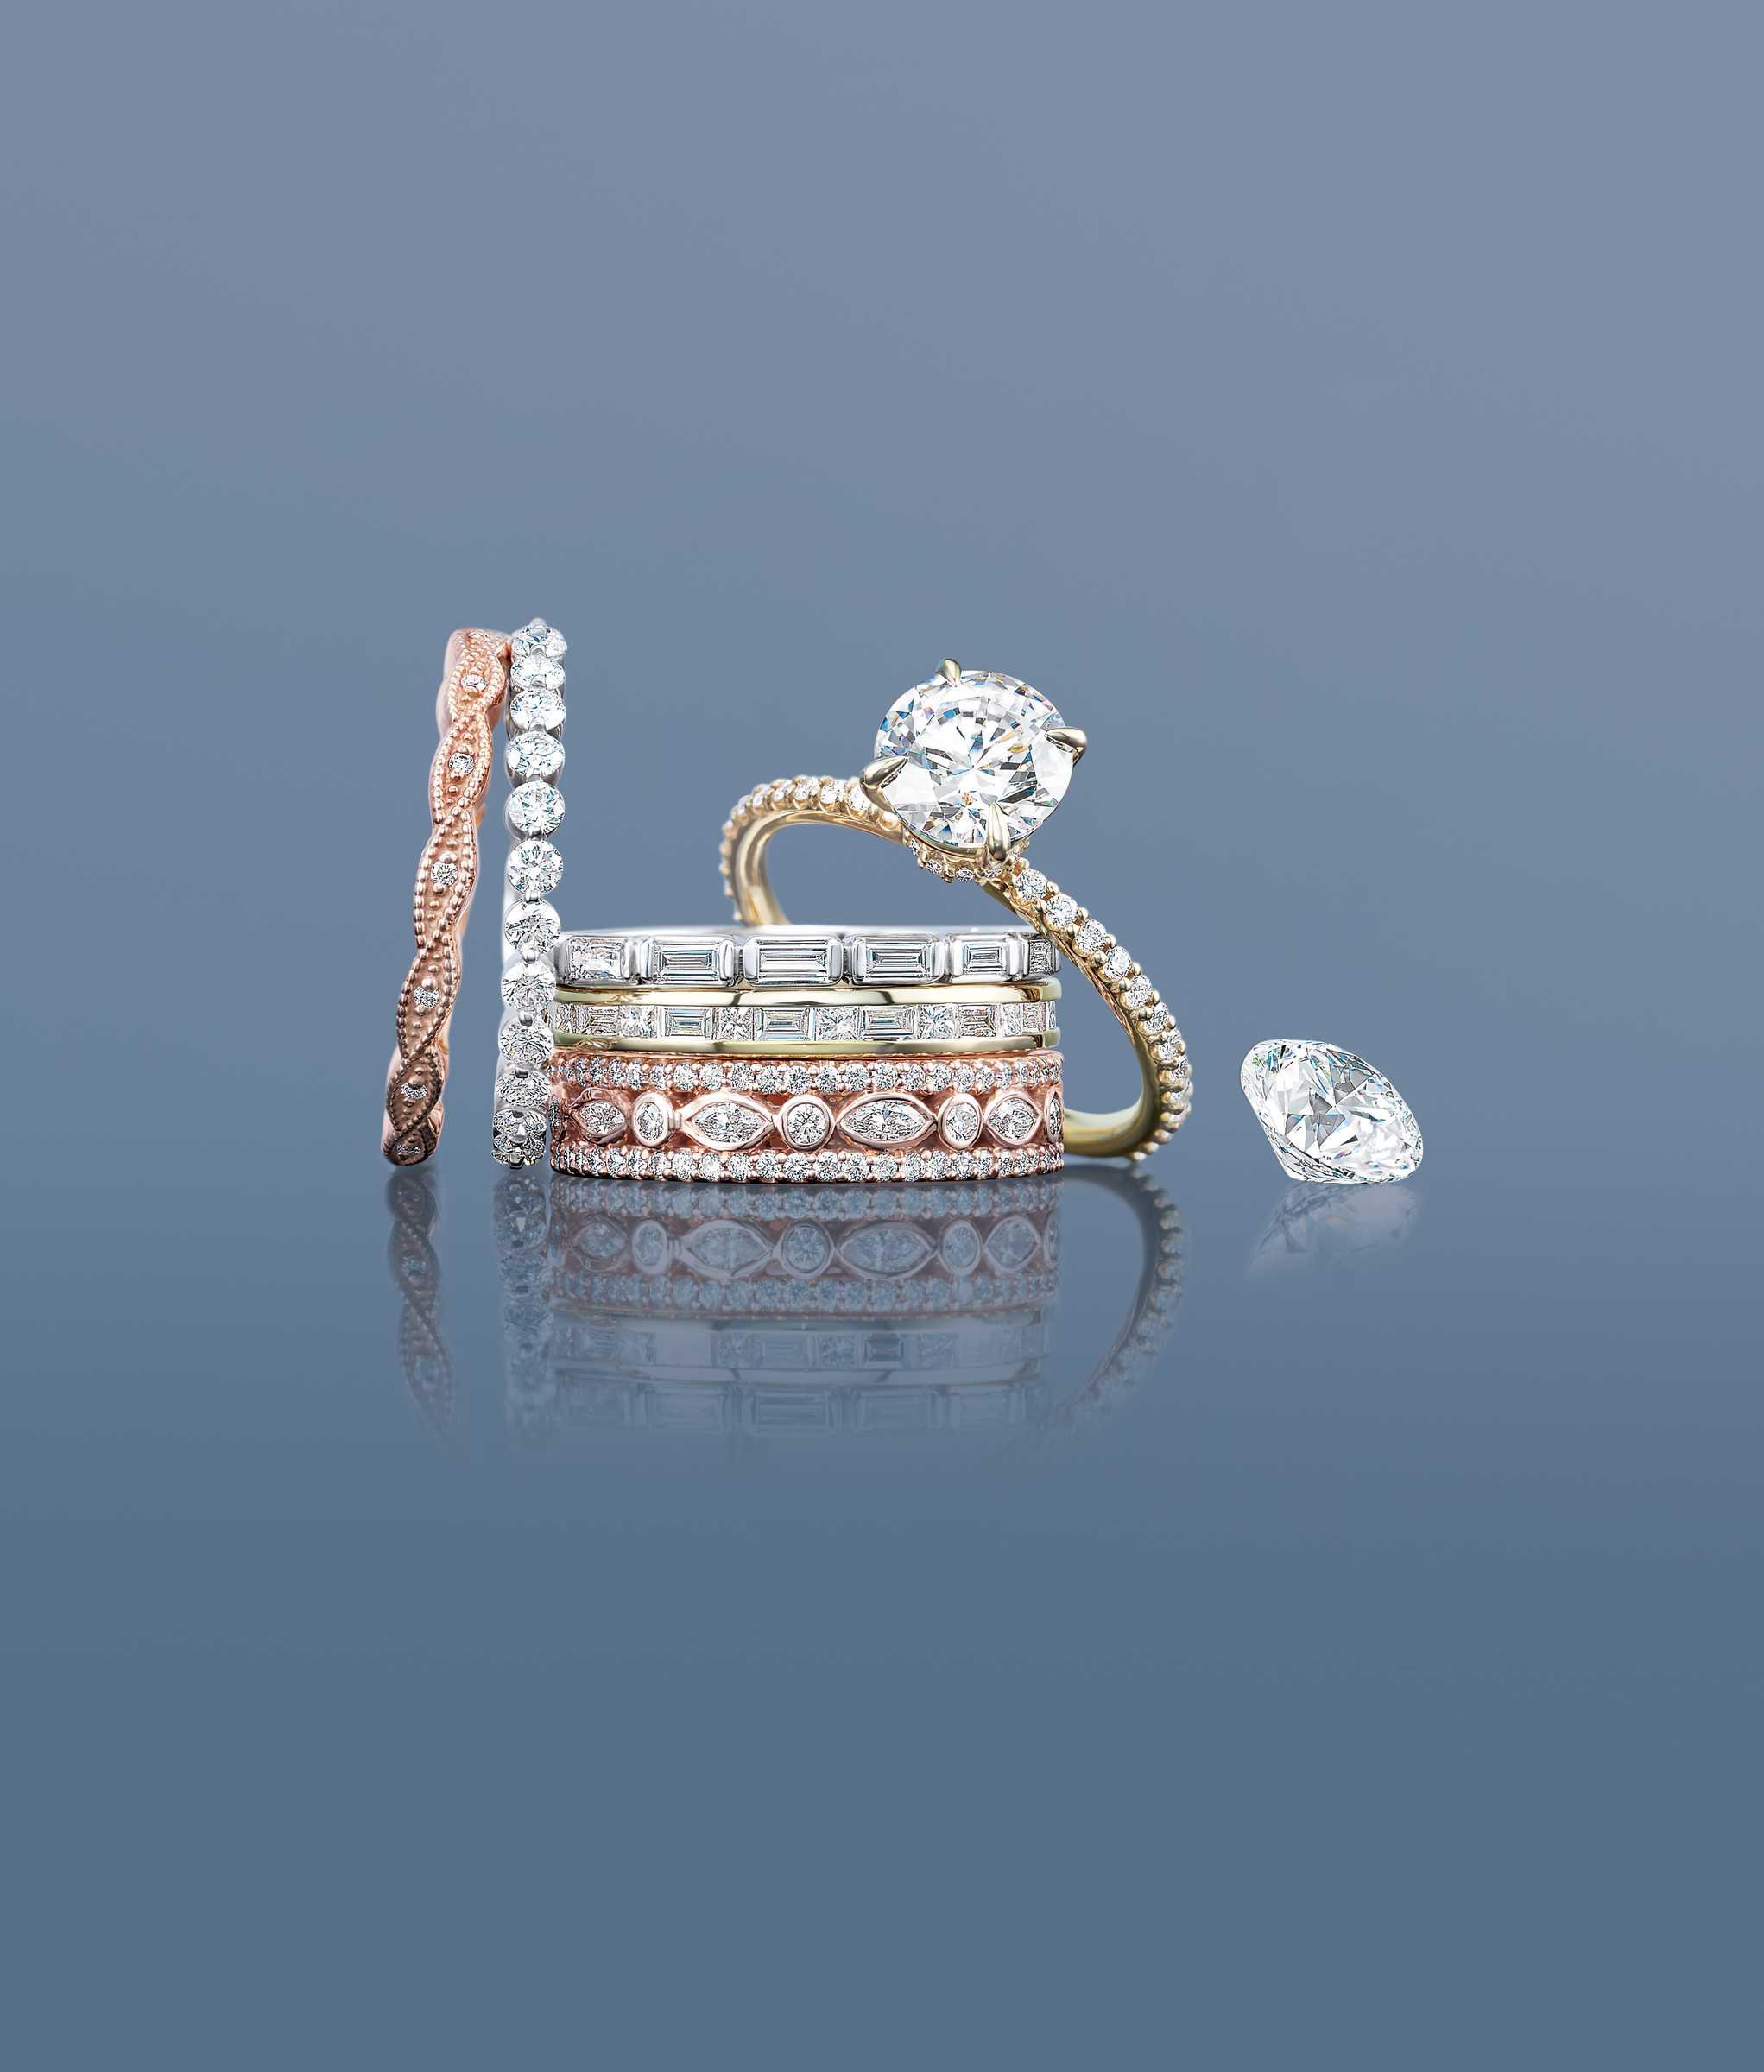 Jwo Jewelers Jewelry Articles Trending In Jewelry Design Jewelry Fashion 2017 2018